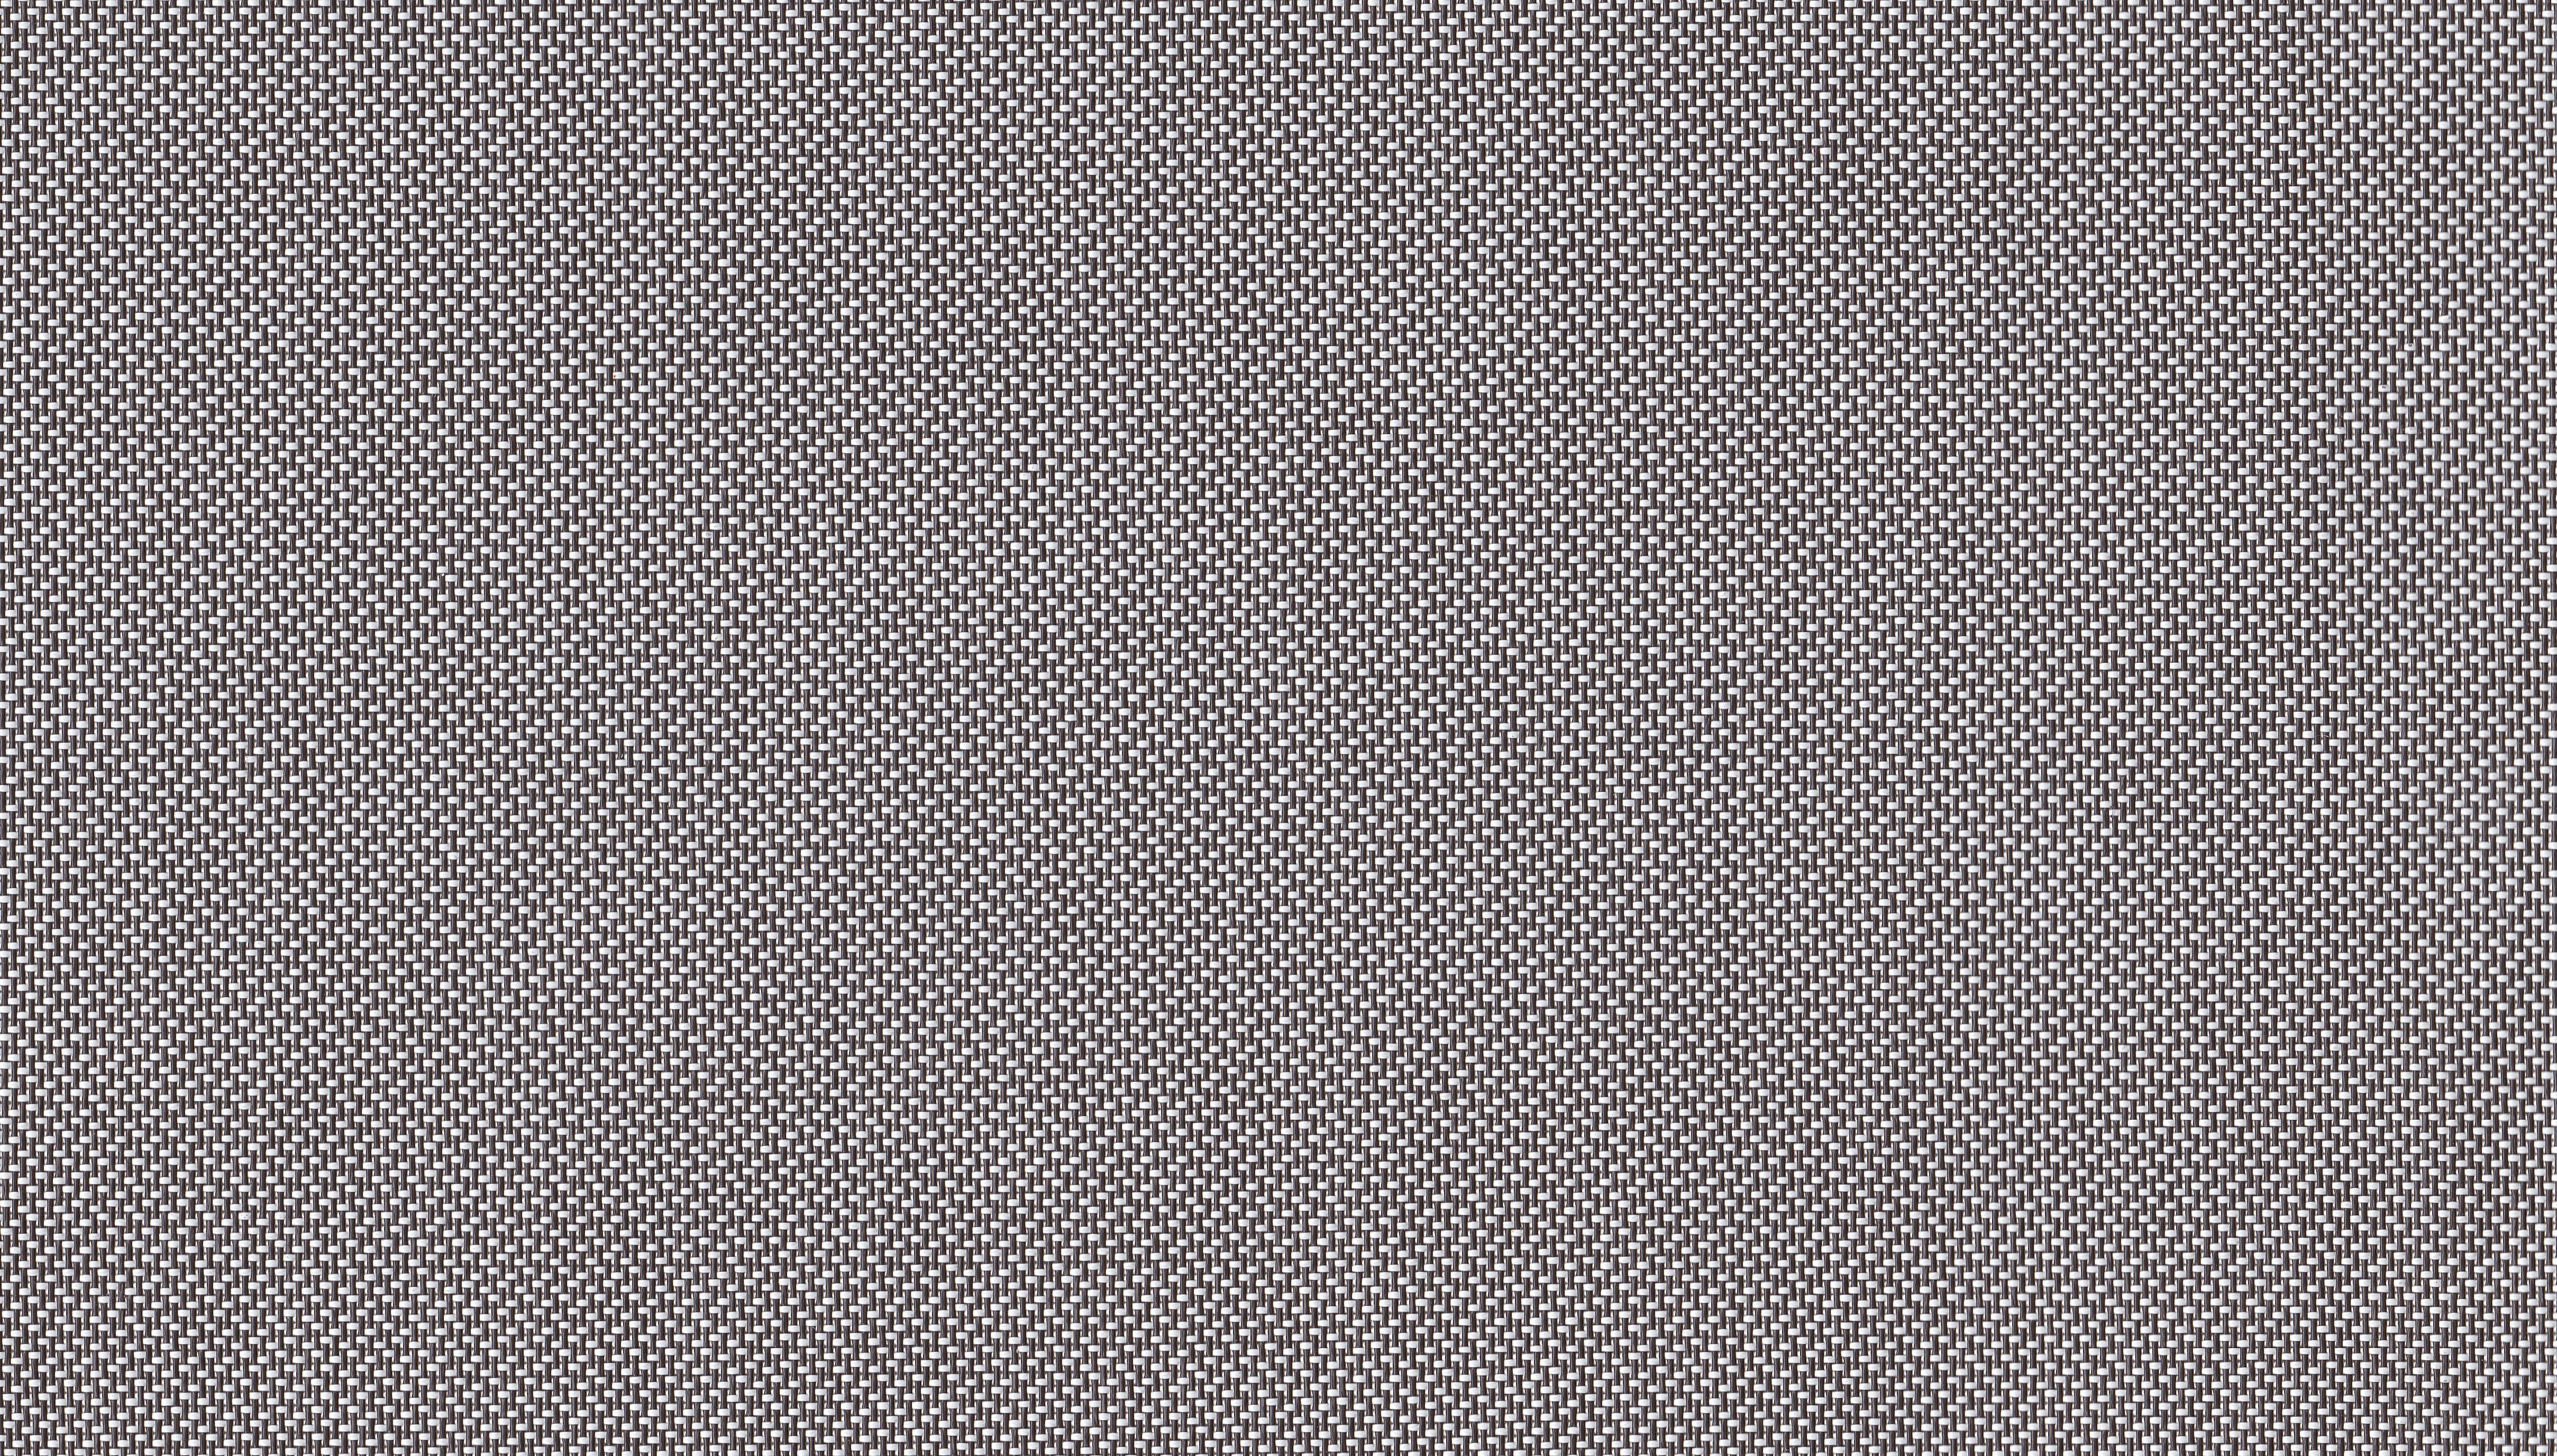 Kostenlose foto : Textur, Stock, Muster, Linie, Makro, grau ...